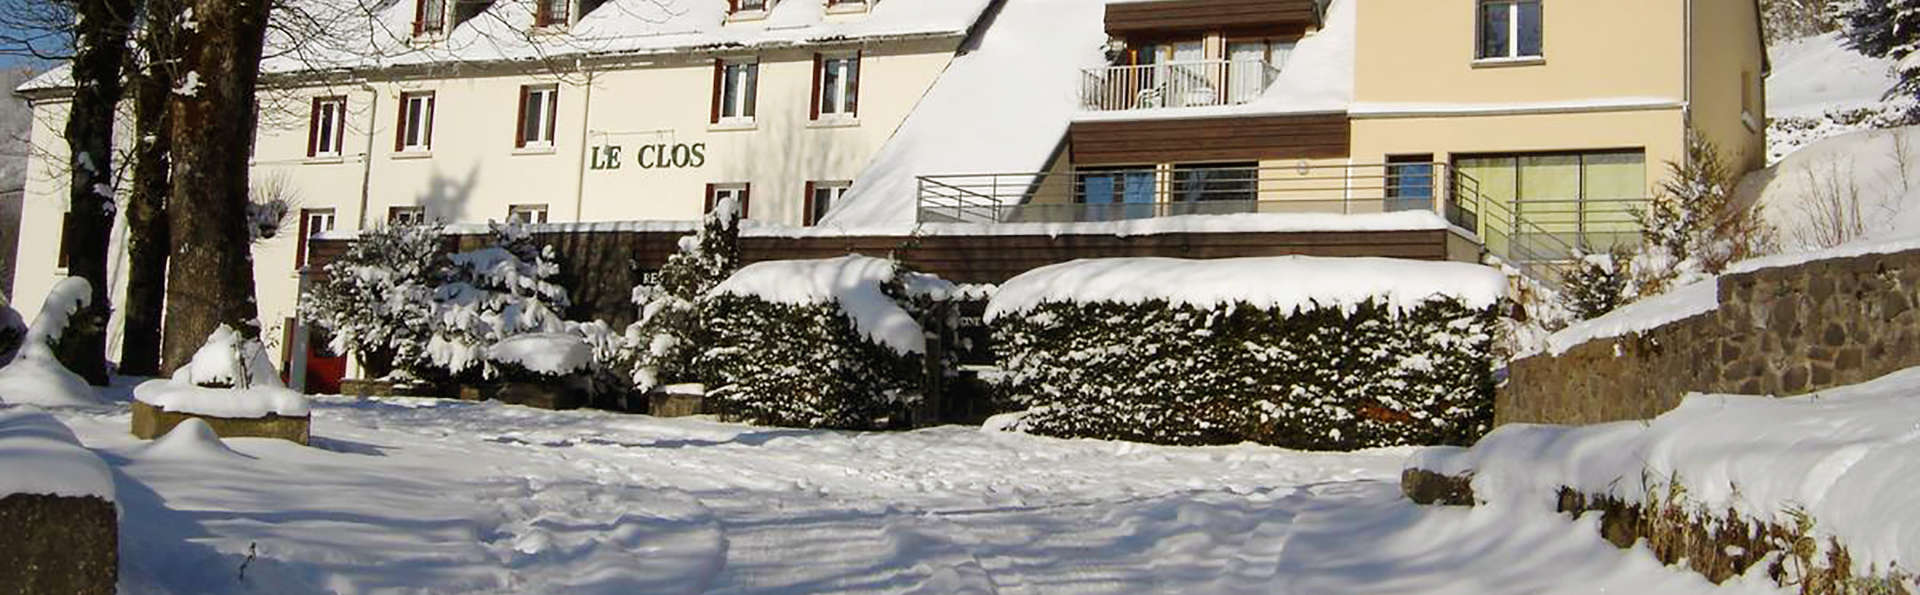 Hôtel Restaurant Le Clos - EDIT_Fachada_2.jpg